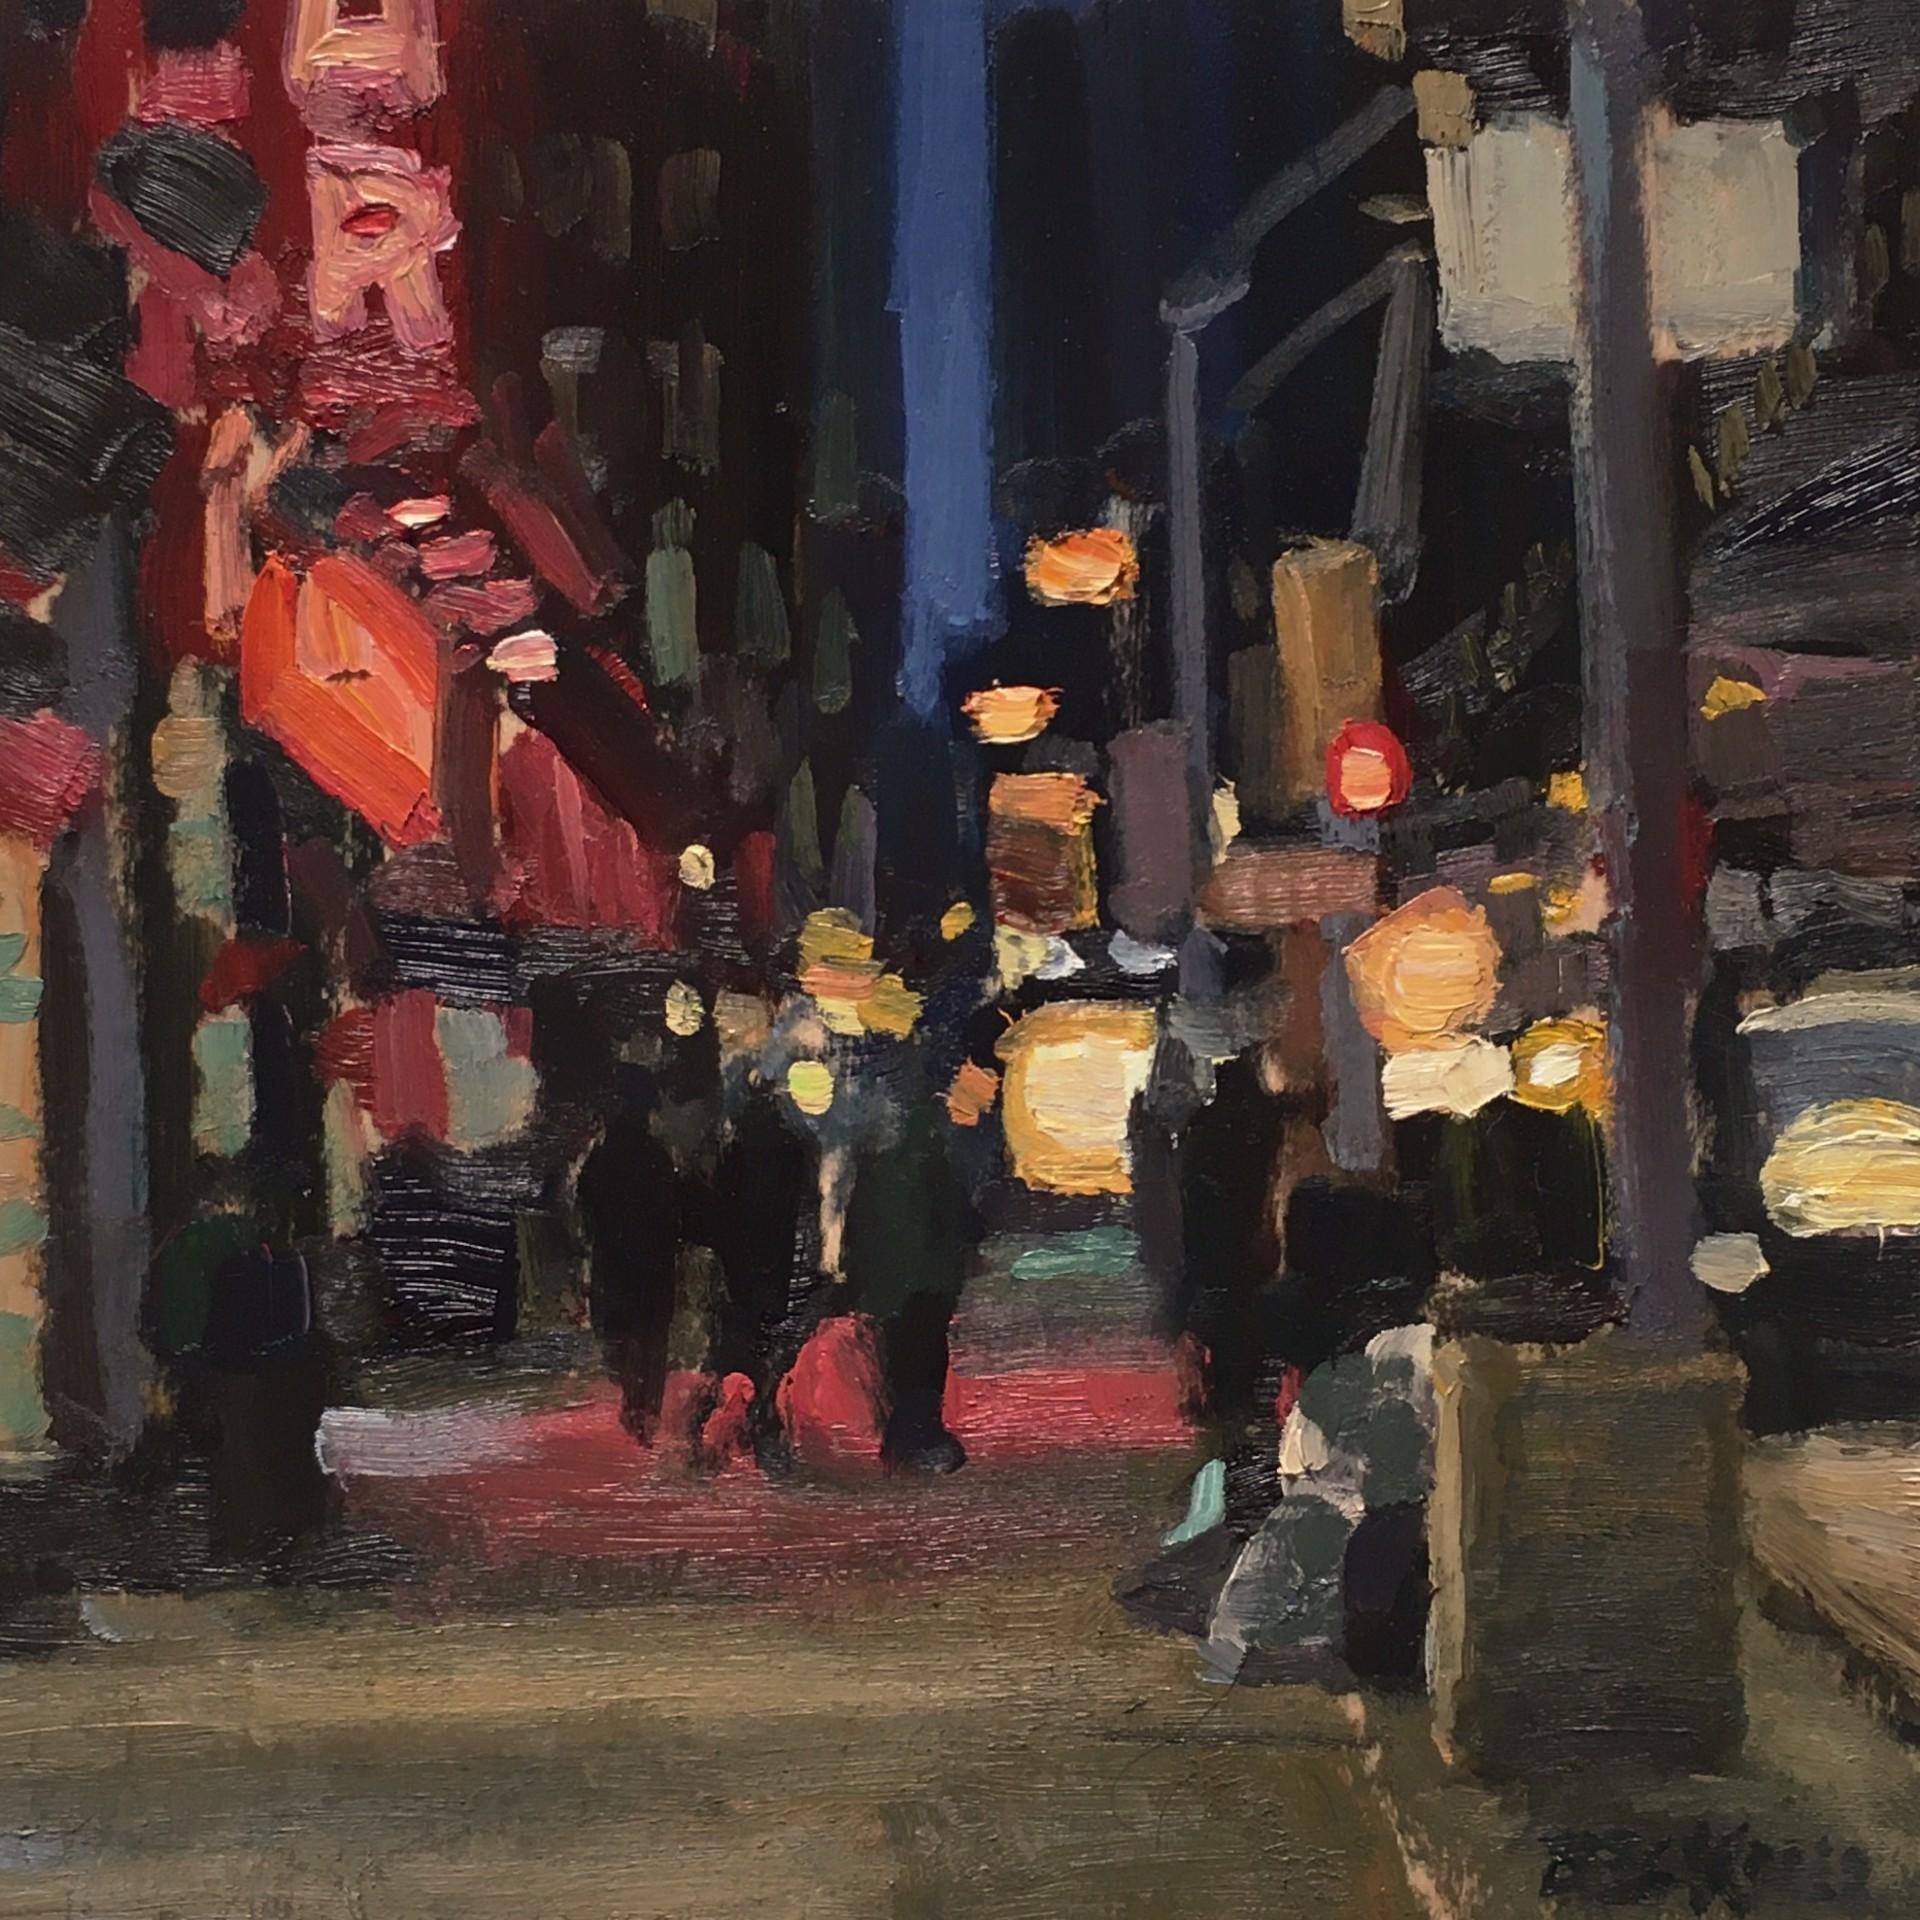 Barlights by Jim Beckner